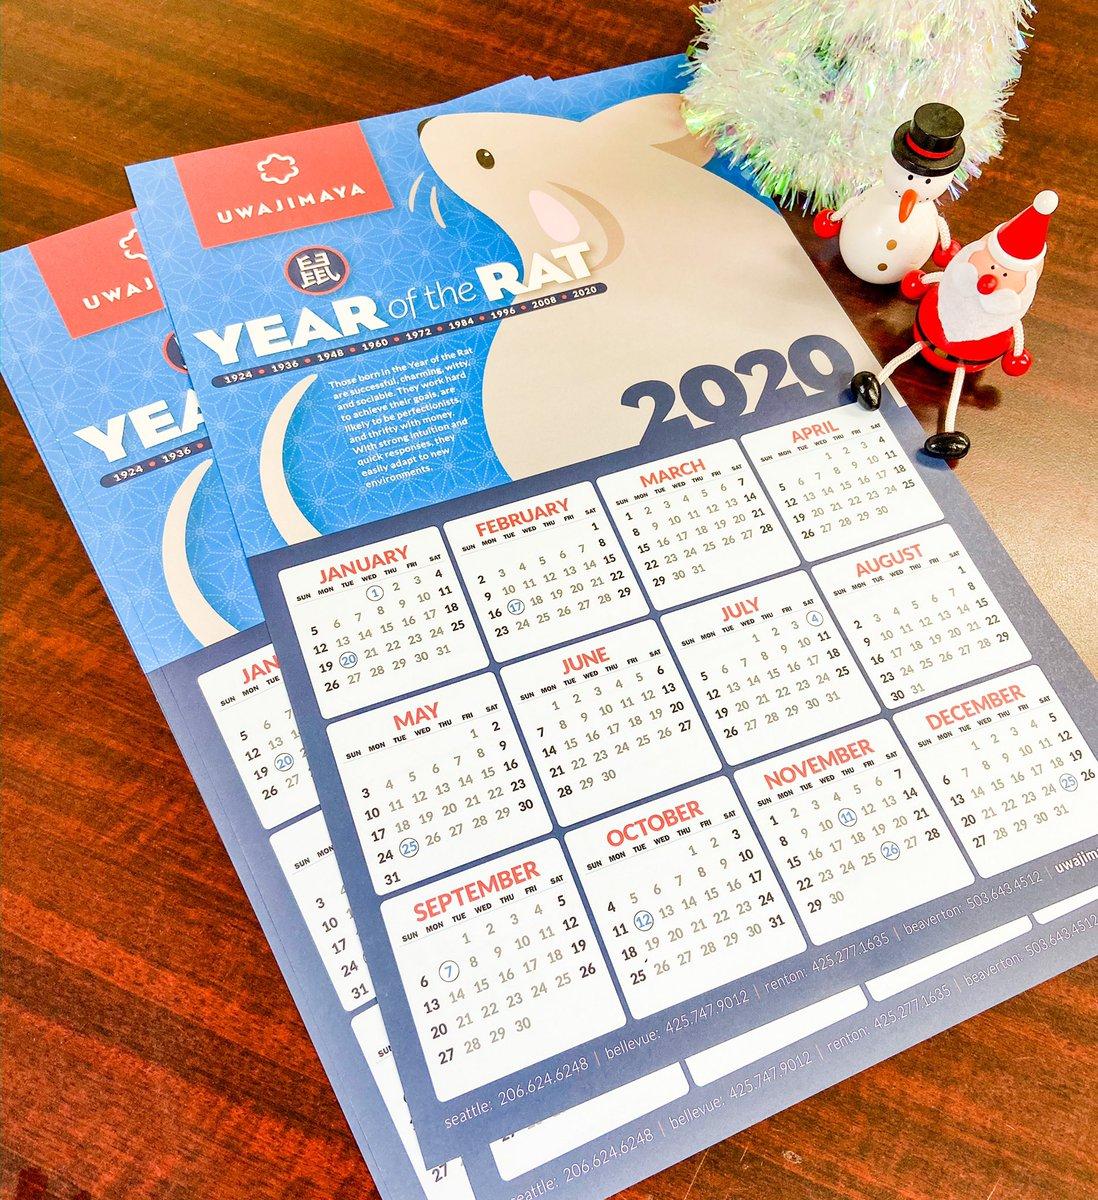 Uwajimaya On Twitter Our Free One Page Year Of The Rat Calendars Are Now Available At All Uwajimaya Locations Yearoftherat シアトル ポートランド Pnw Pacificnorthwest Newyearsdayband Https T Co Ktgoawawhb